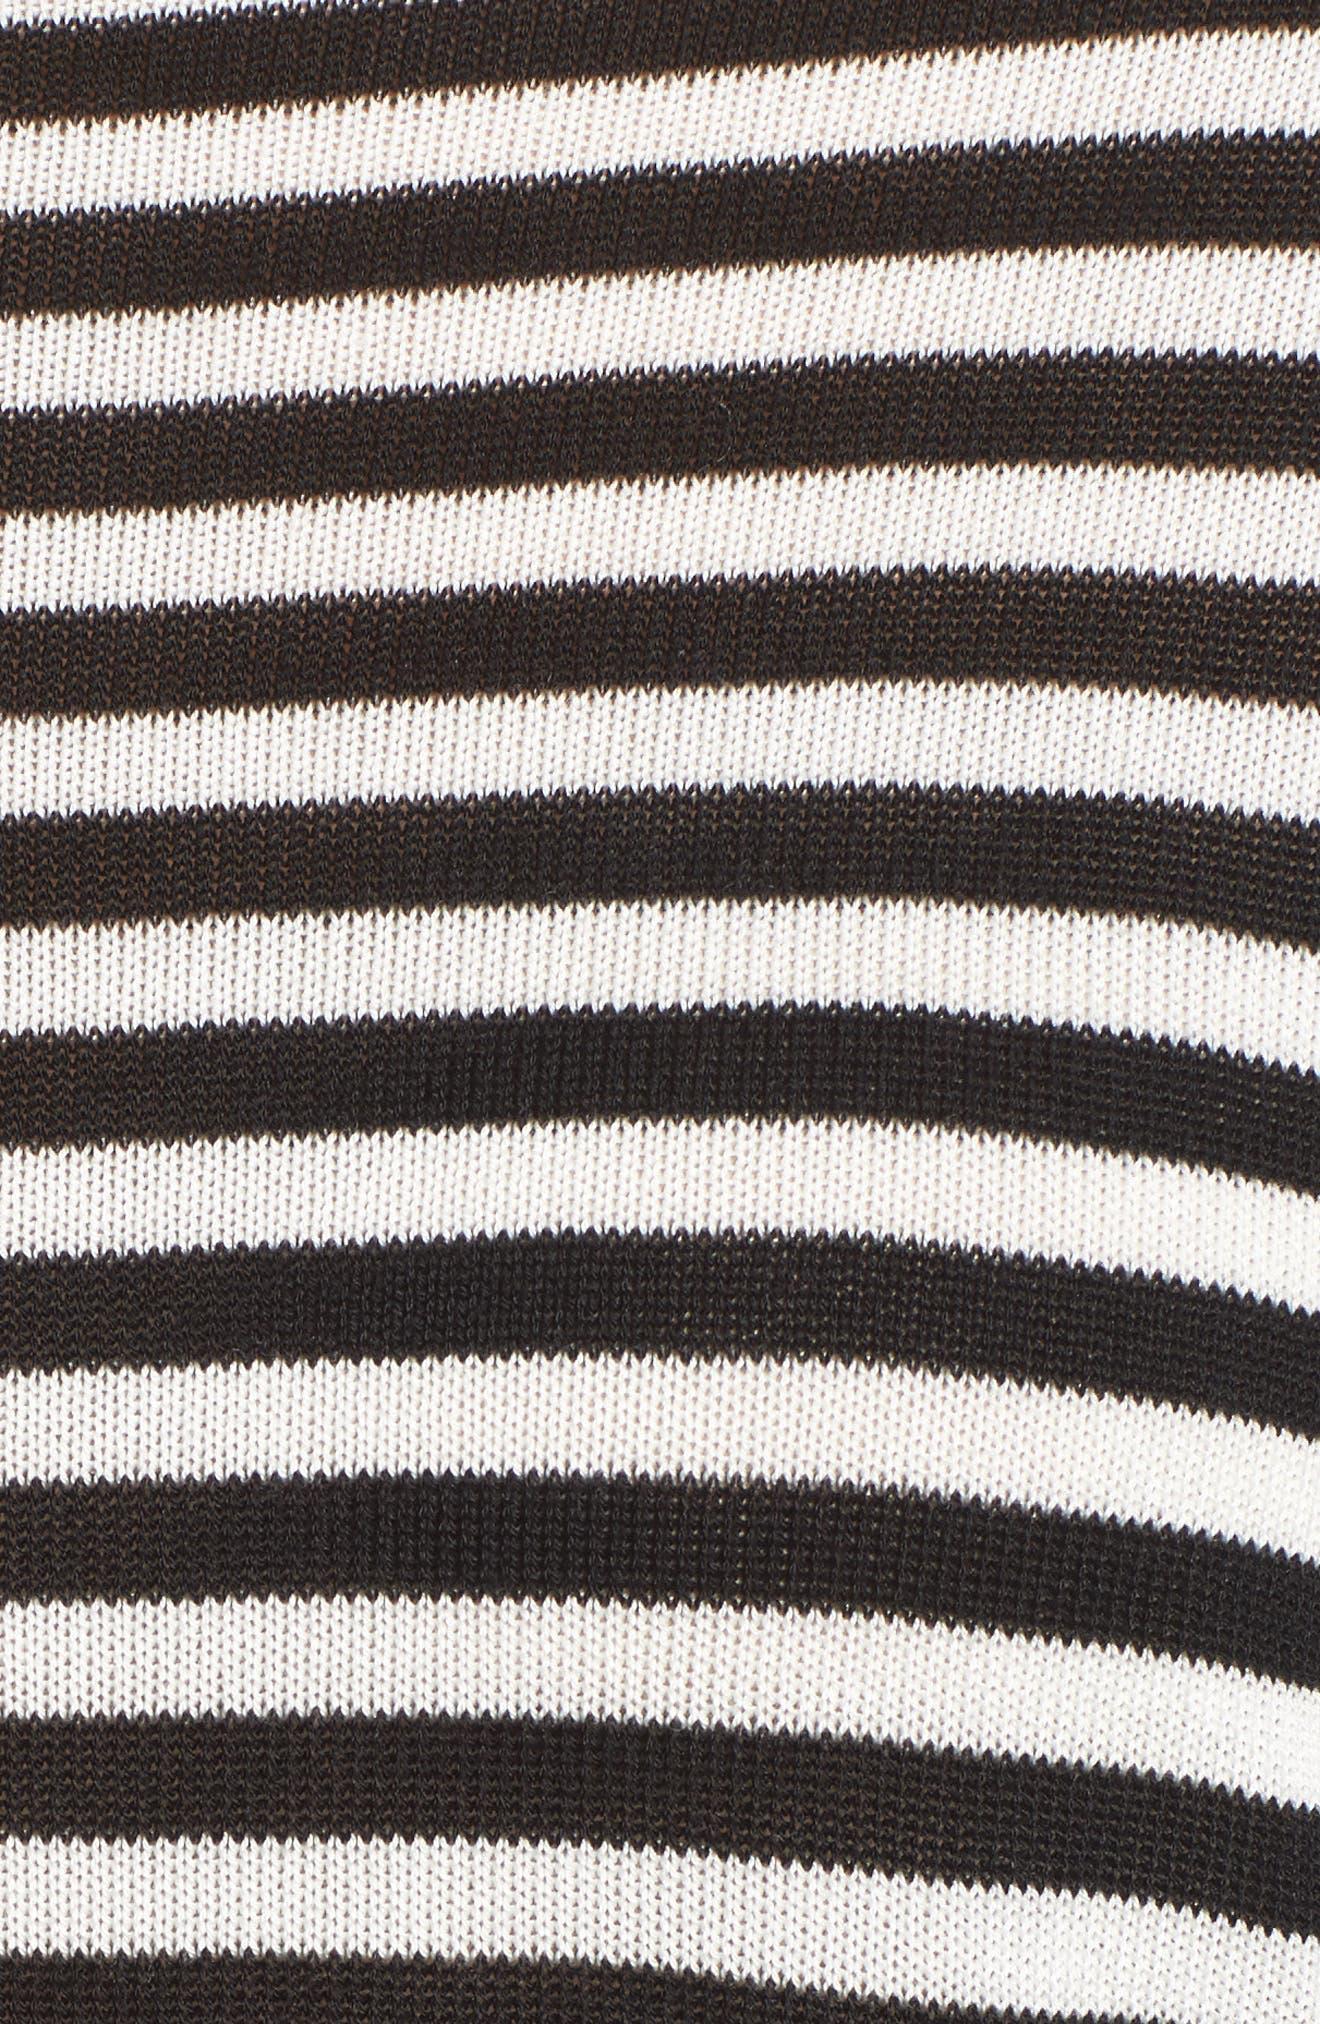 Stripe Tencel<sup>®</sup> Lyocell Knit Sweater,                             Alternate thumbnail 5, color,                             Black/ Soft White